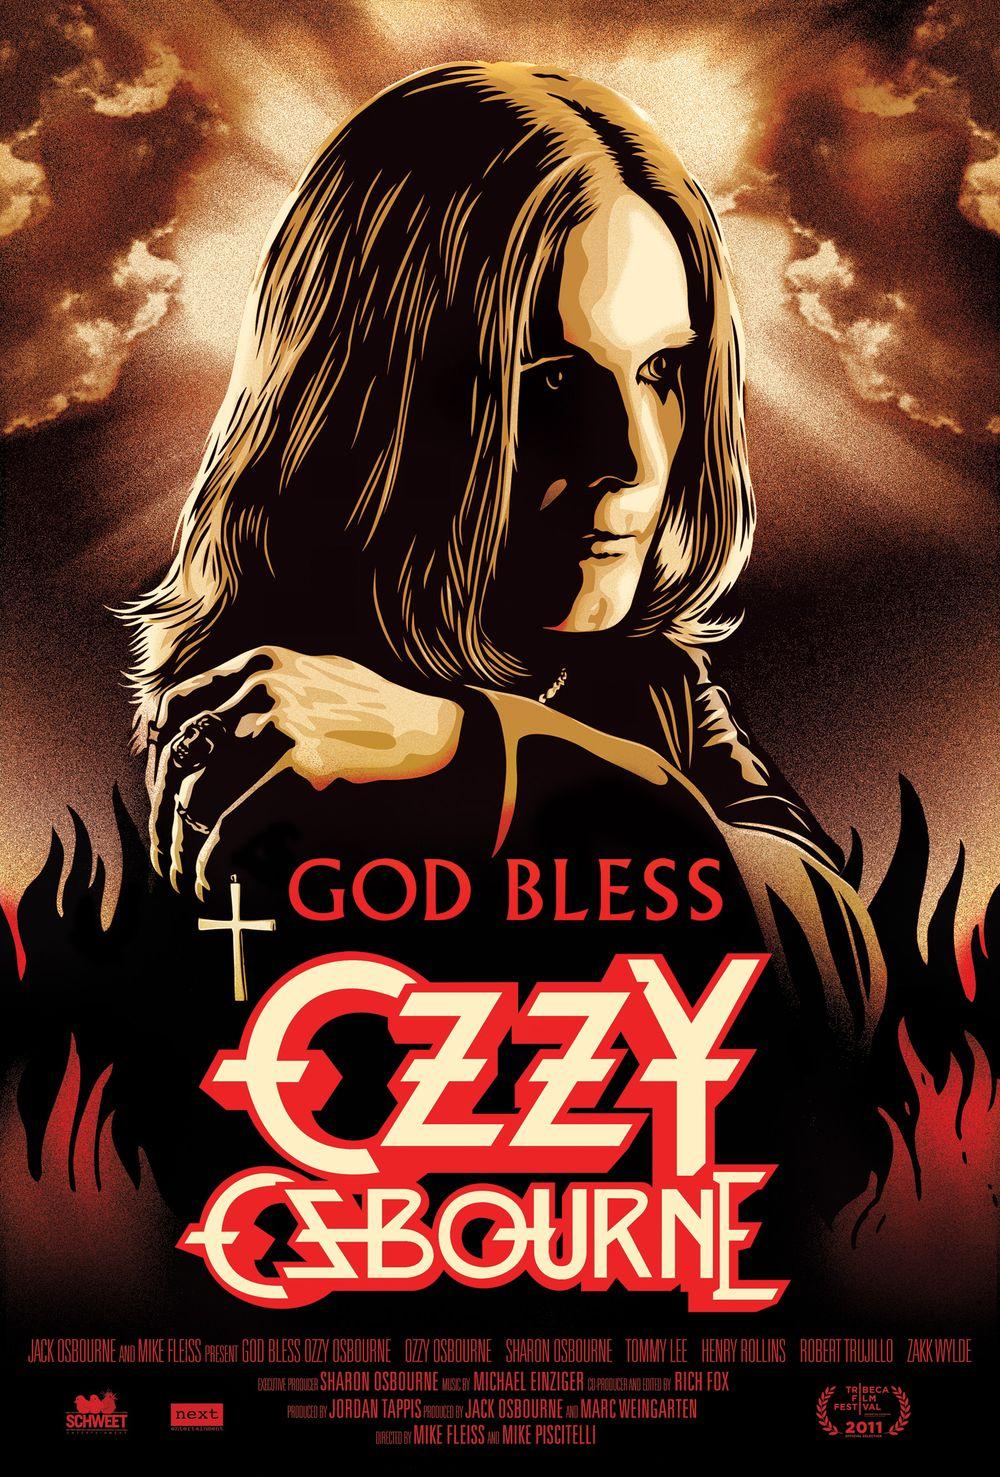 OZZY OSBOURNE - God Bless Ozzy Osbourne cover